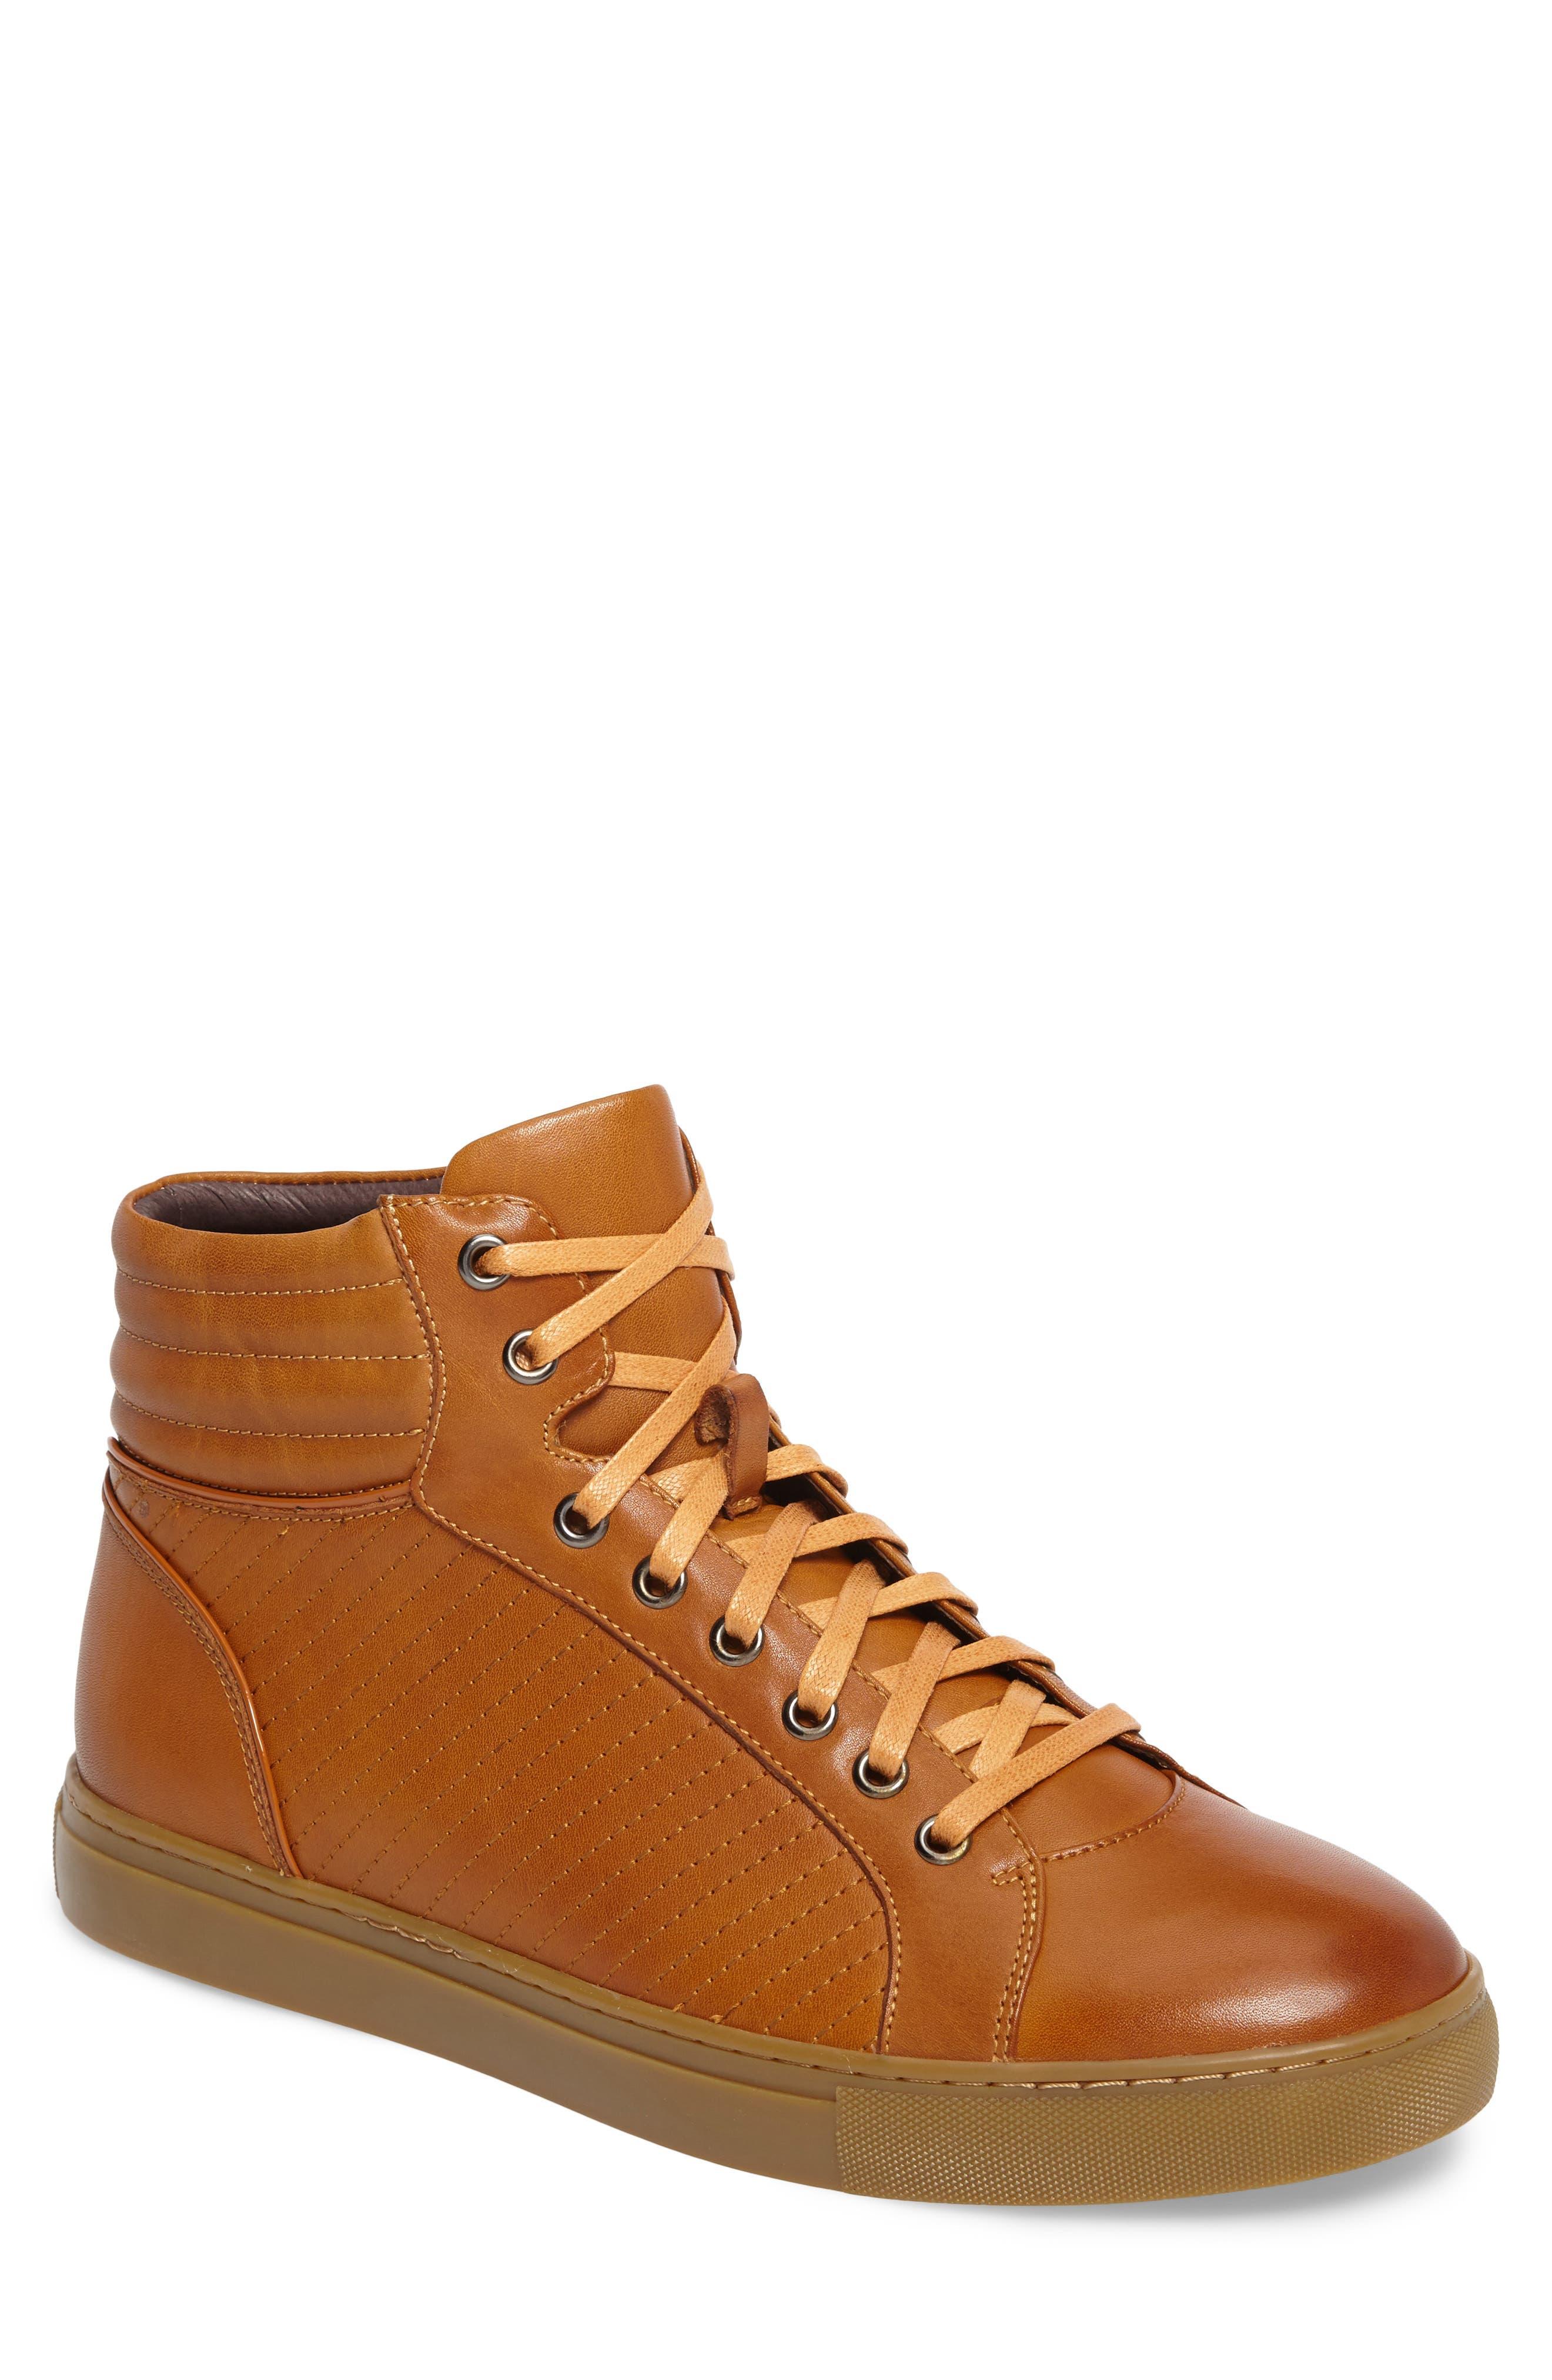 Youse Sneaker,                         Main,                         color, Cognac Leather